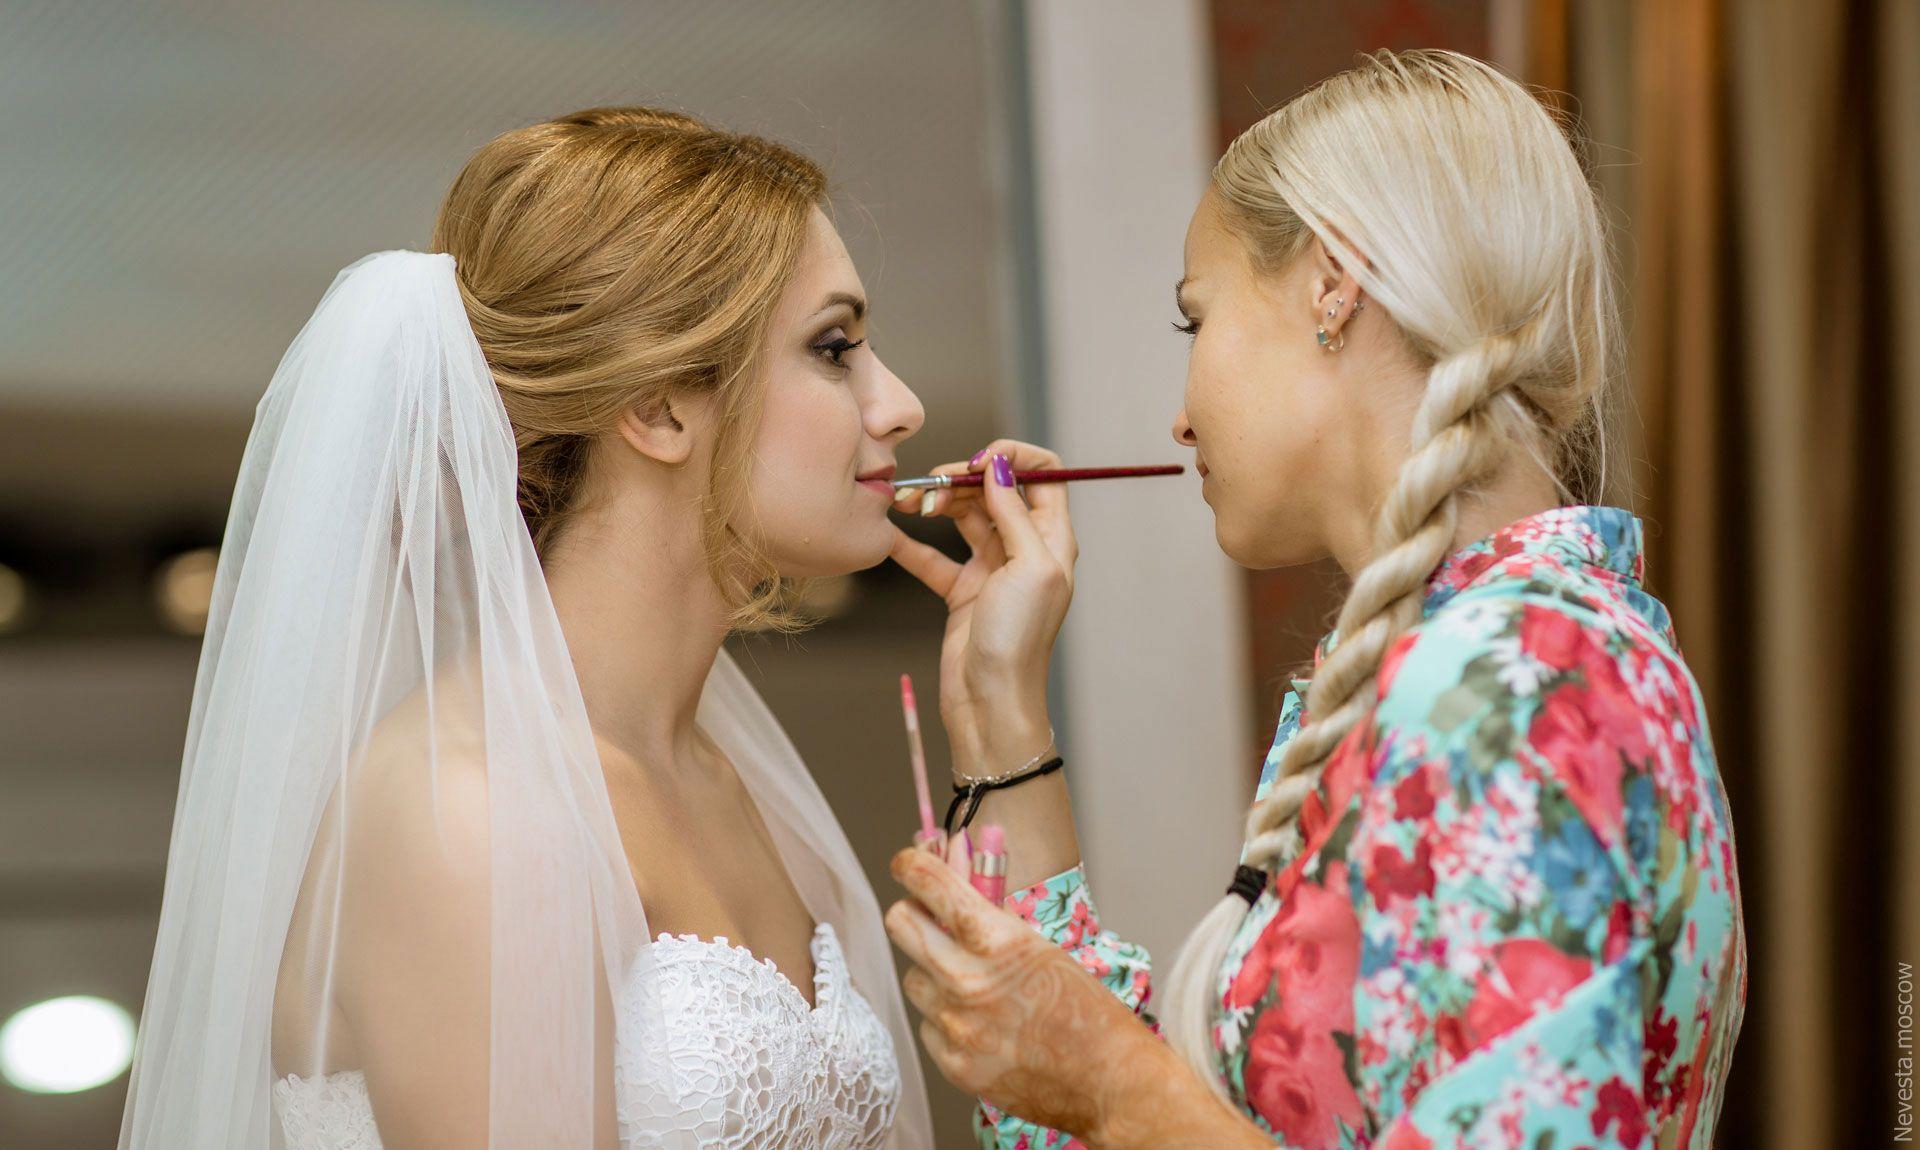 Карина Мишулина, подготовка к свадьбе